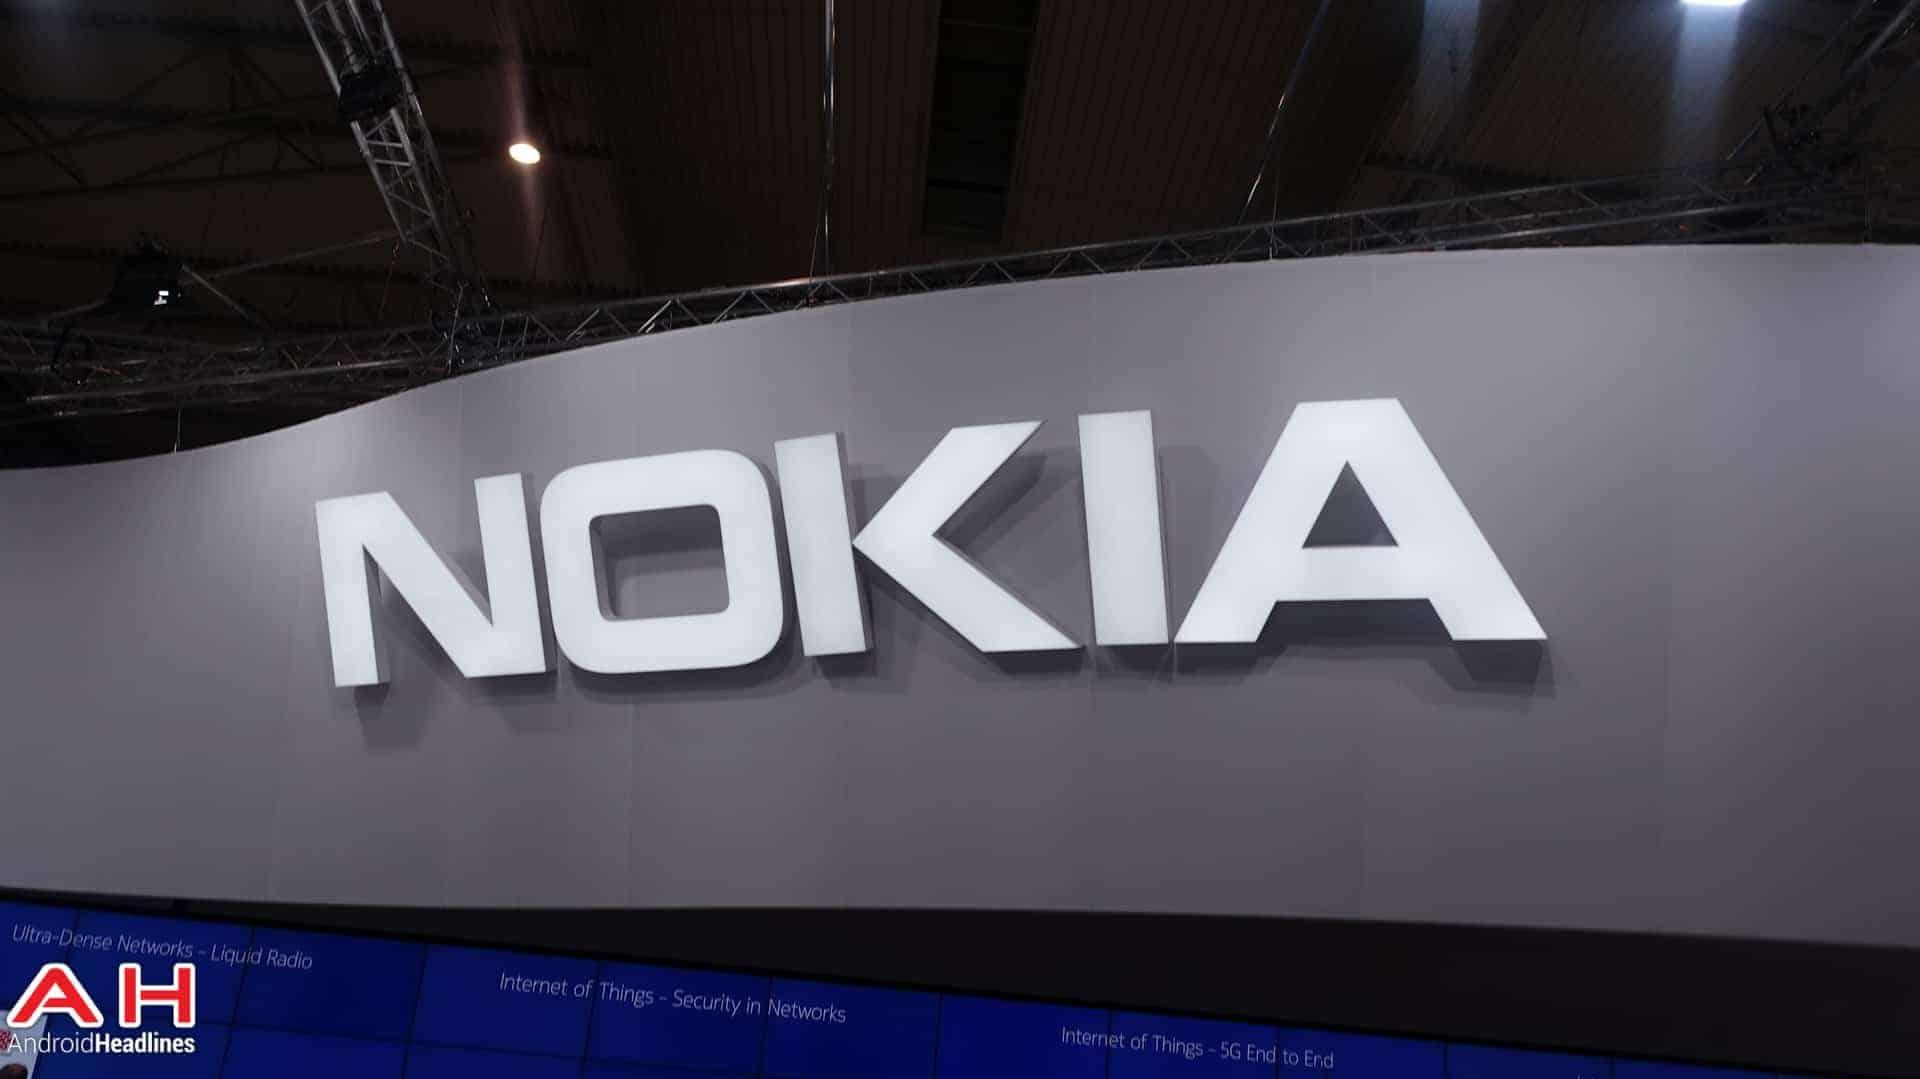 Nokia-Logo-AH1